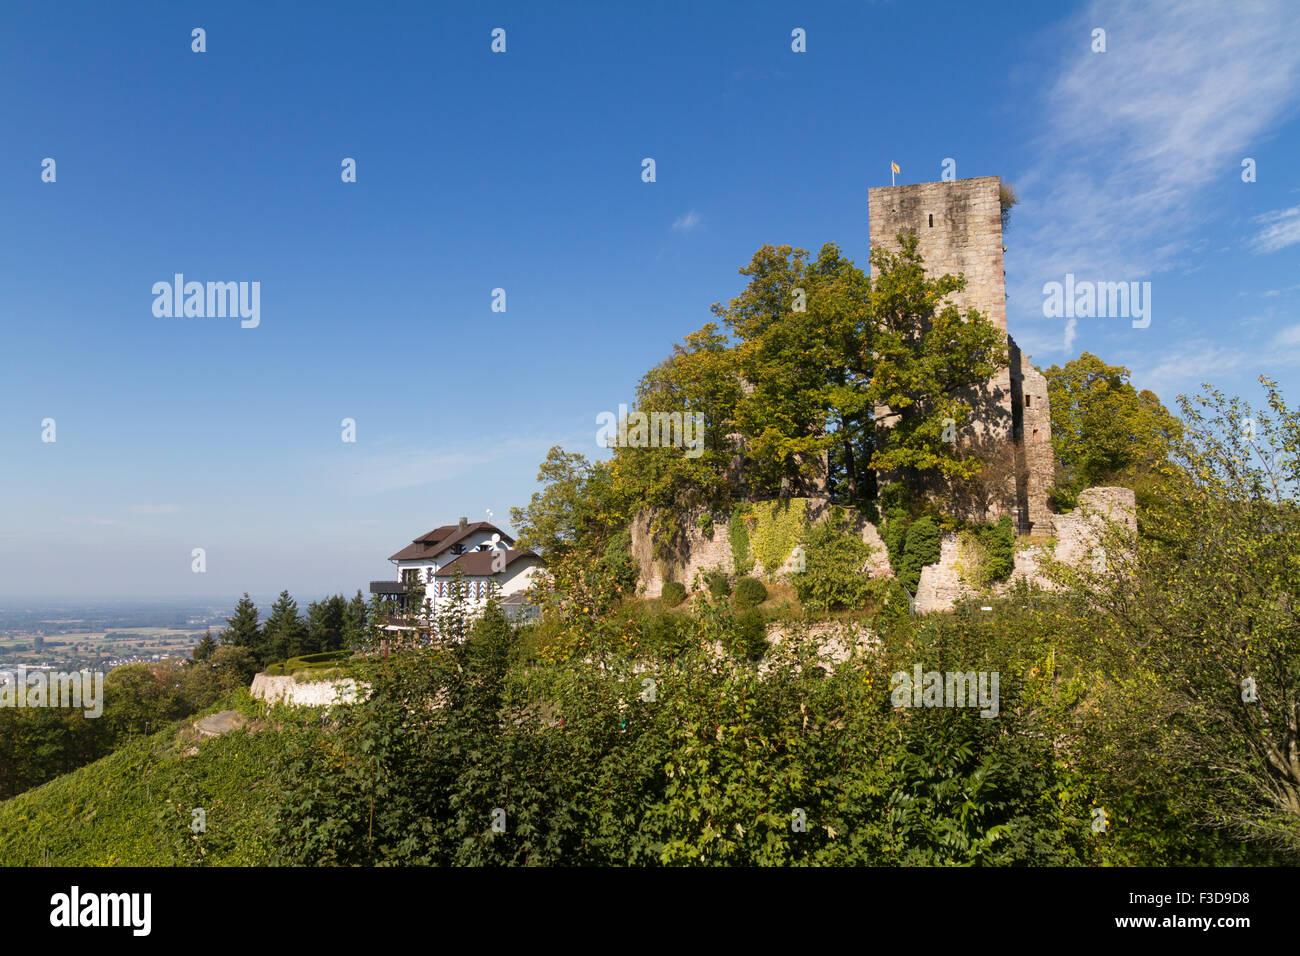 Burgruine Neuwindeck in Buhl, Baden-Wurttemberg, Germany - Stock Image